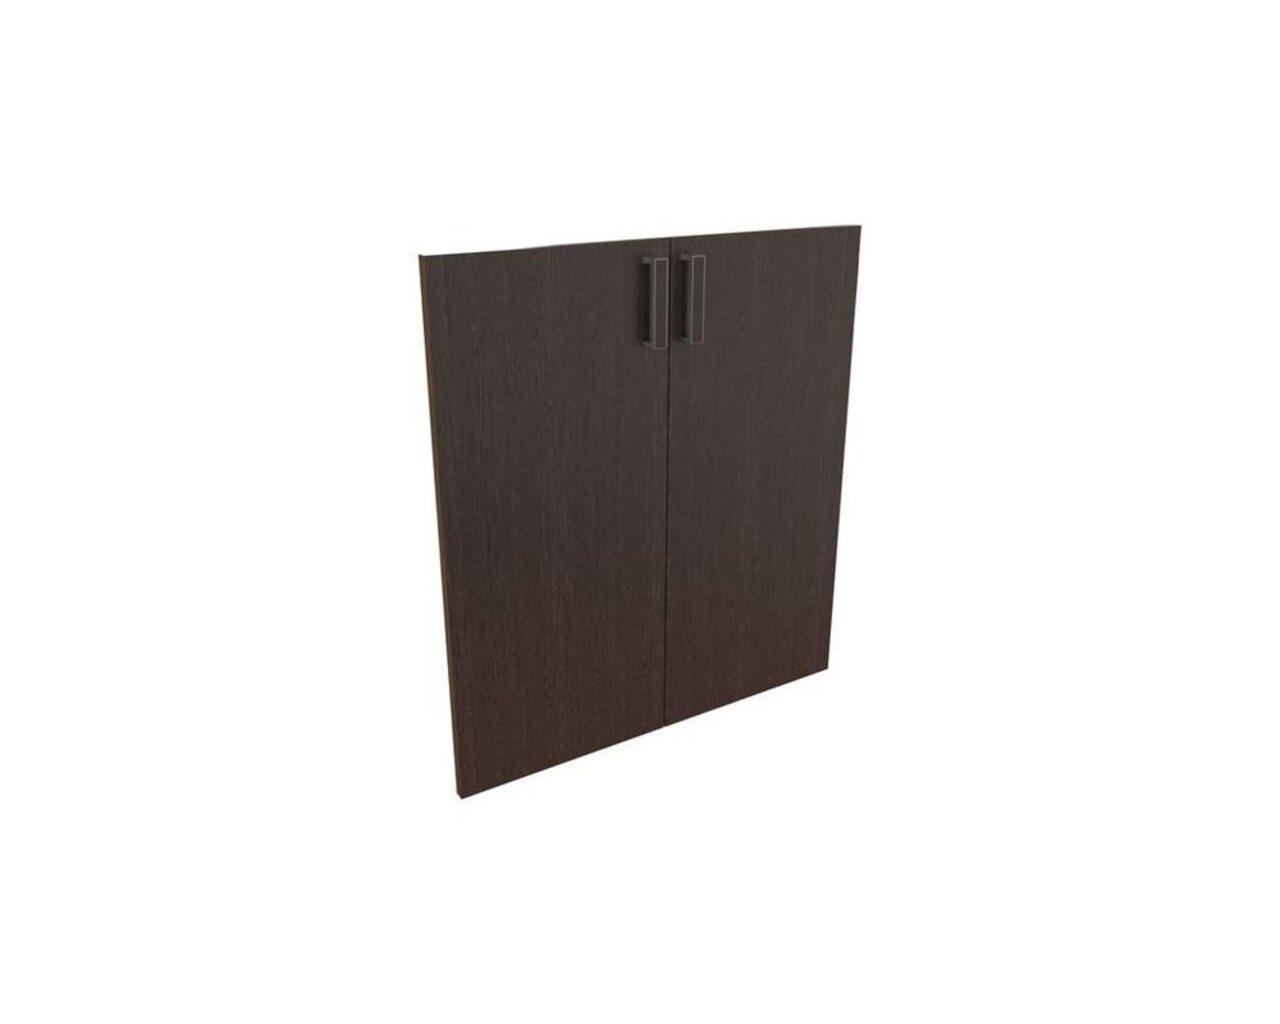 Двери из ЛДСП к широким стеллажам  Приоритет II 72x2x117 - фото 1